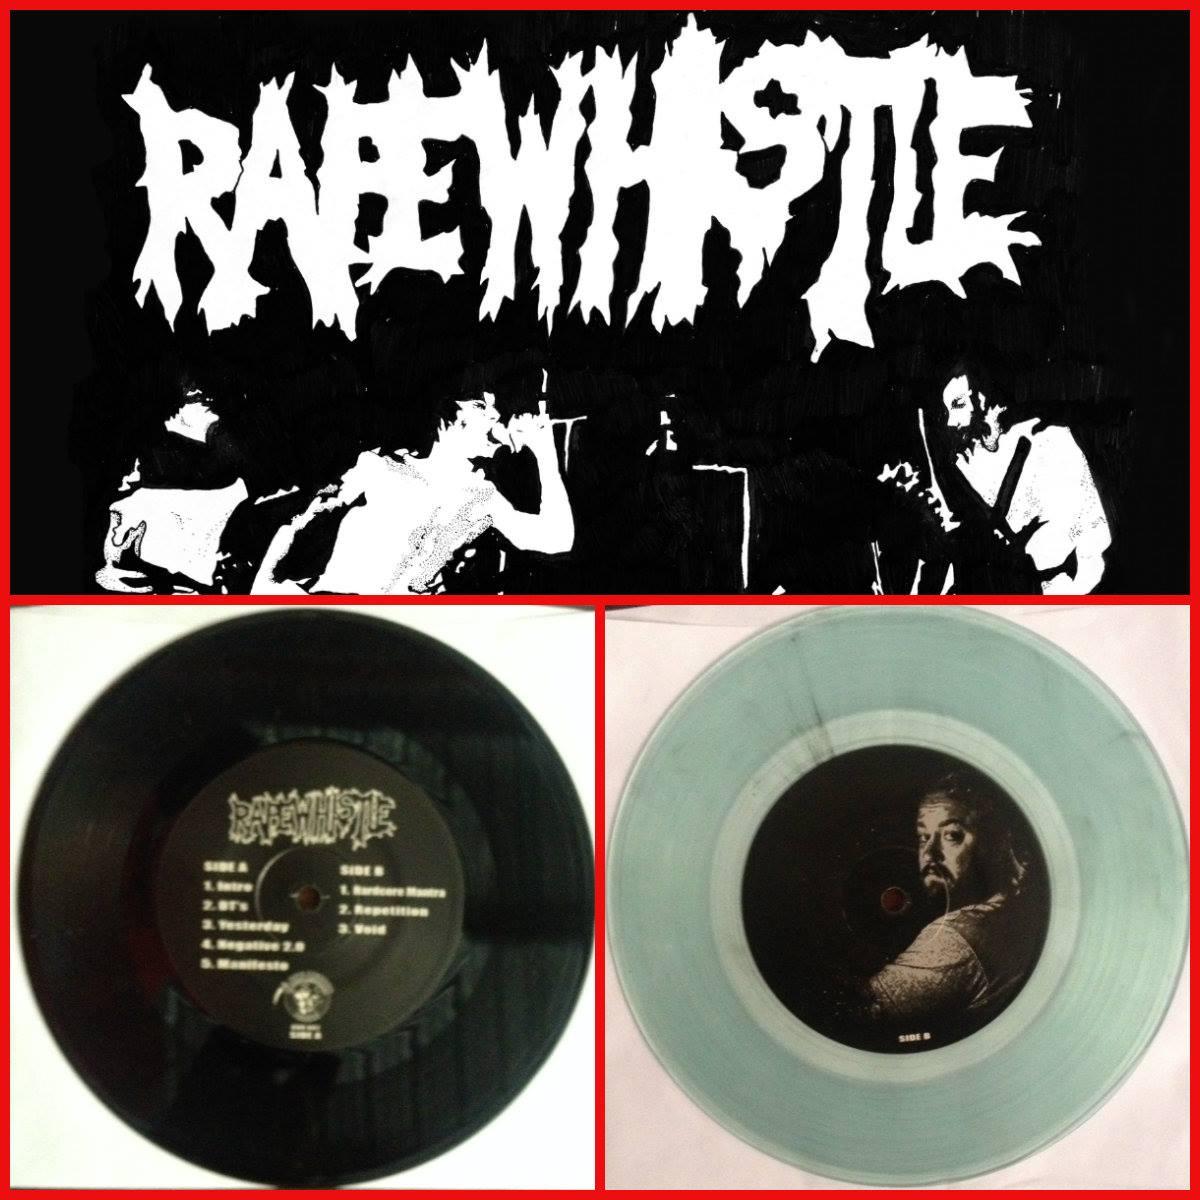 Rapewhistle - Rapewhistle (Memorial release)